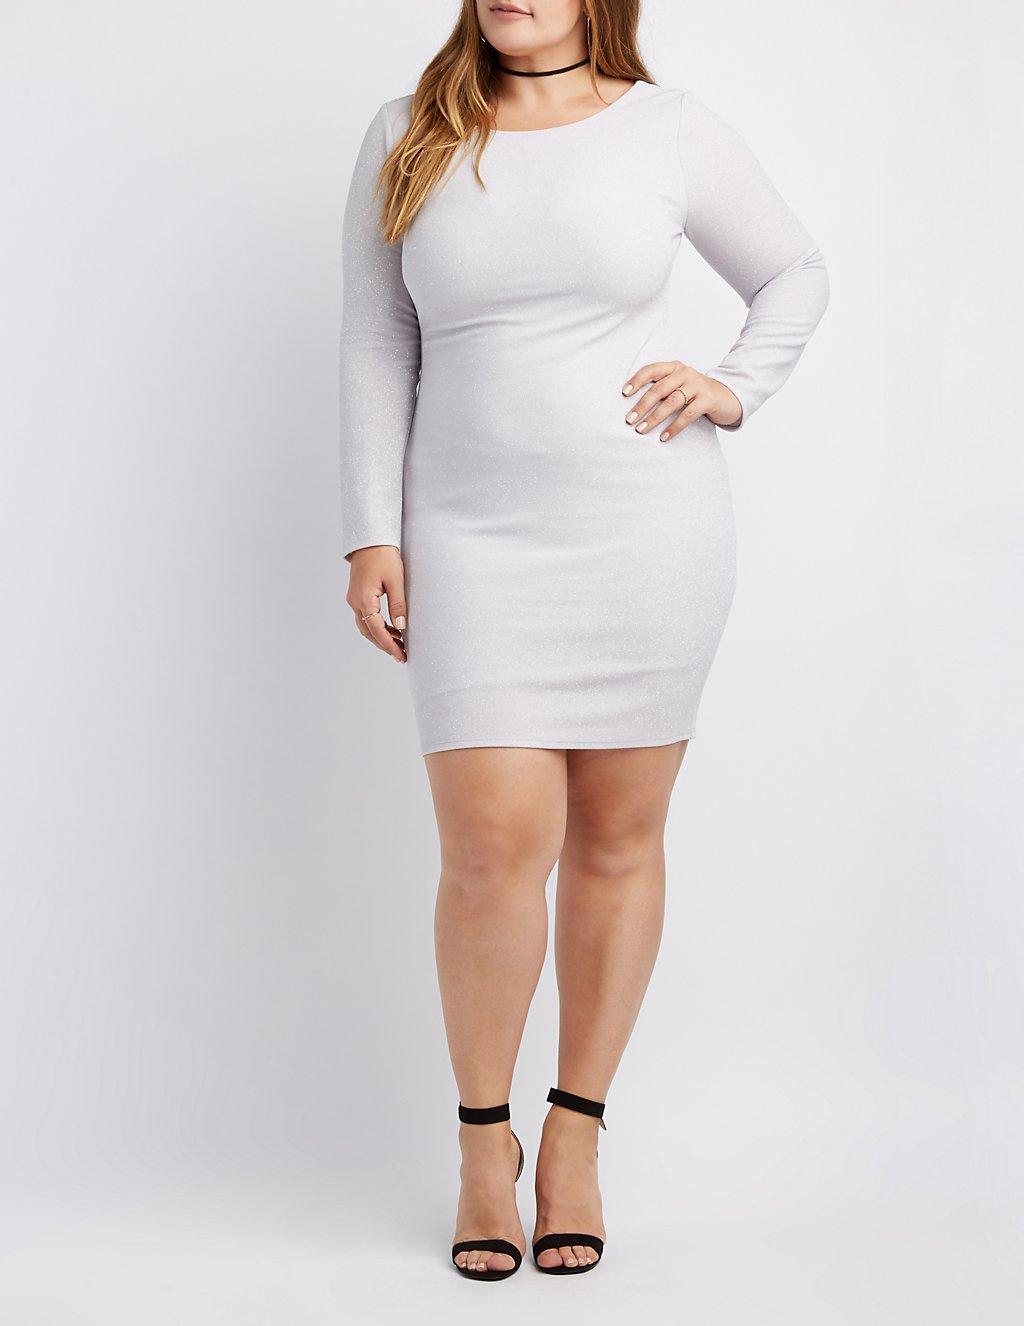 Plus Size Shimmer Knit Open-Back Bodycon Dress | Charlotte Russe